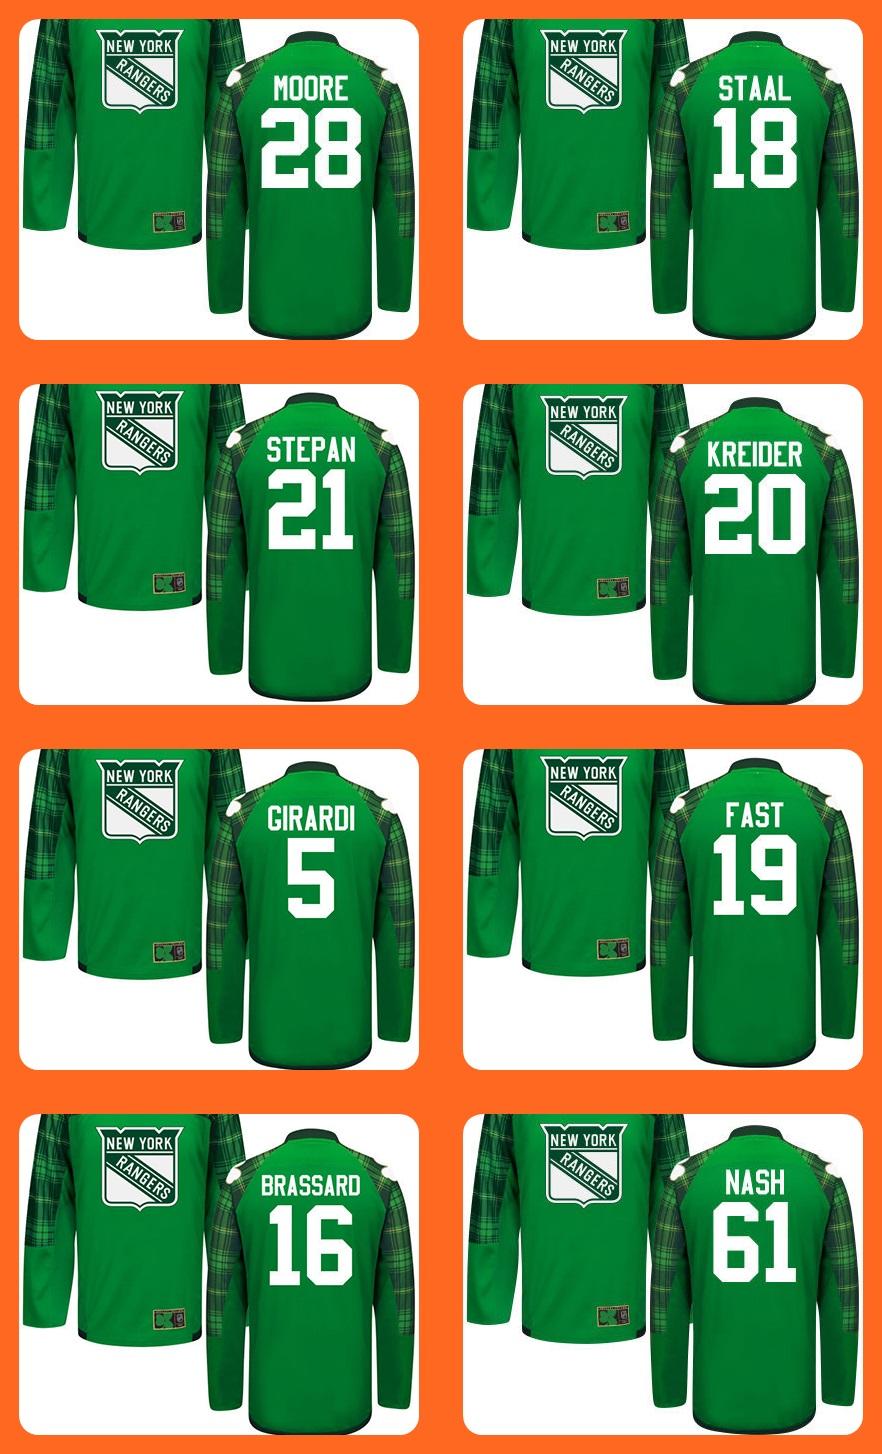 New Mens Green St.Patricks Day Jersey 20 Kreider 5 Girardi 19 Fast 16 Brassard 61 Nash 28 Moore 18 Staal 21 Stepan Jerseys<br><br>Aliexpress